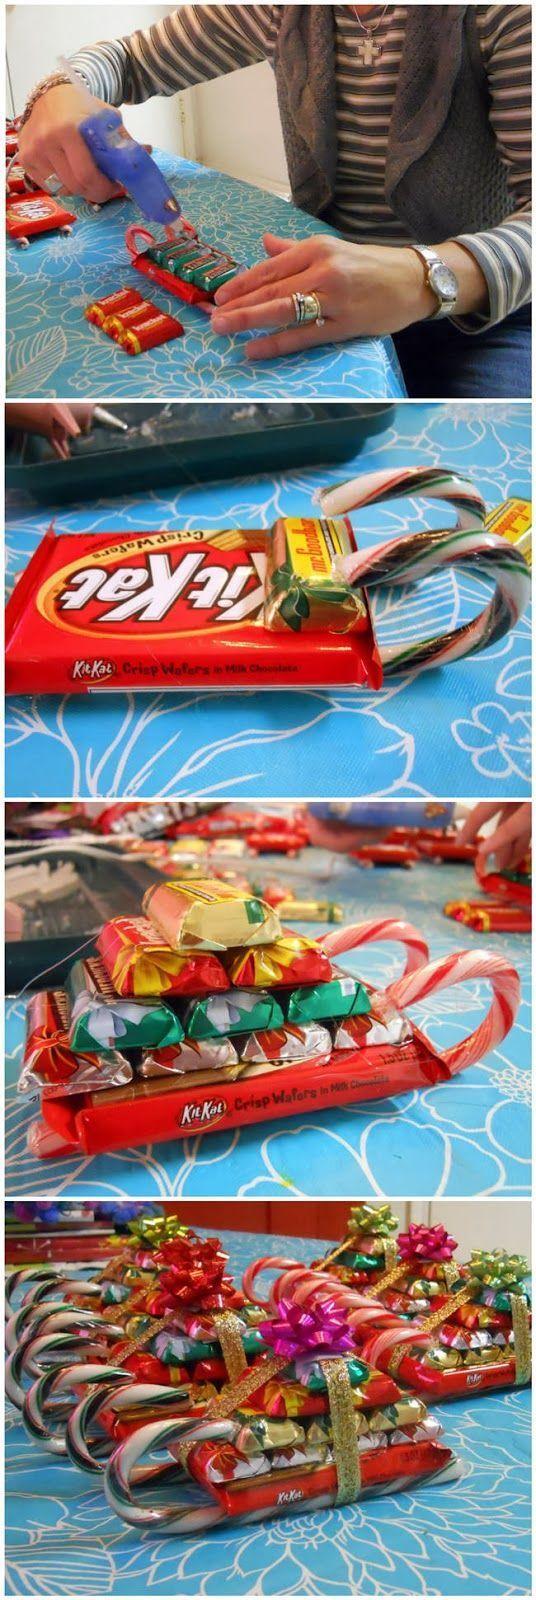 10 Tutorials to DIY Christmas Gifts - Pretty Designs